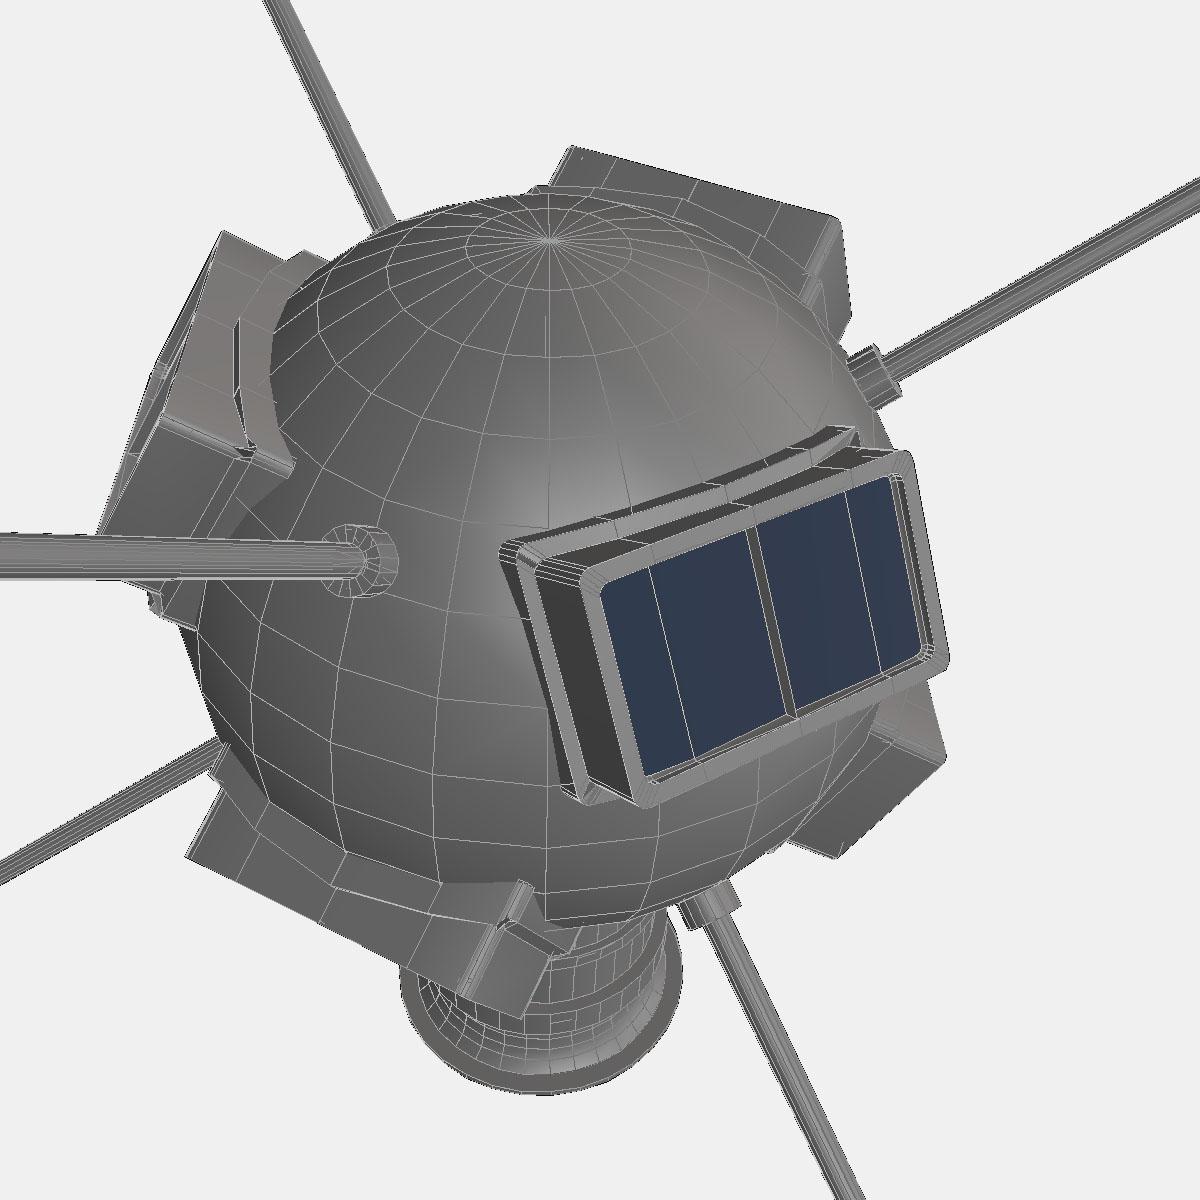 vanguard i satellite 3d model 3ds dxf fbx blend cob dae x obj 163933